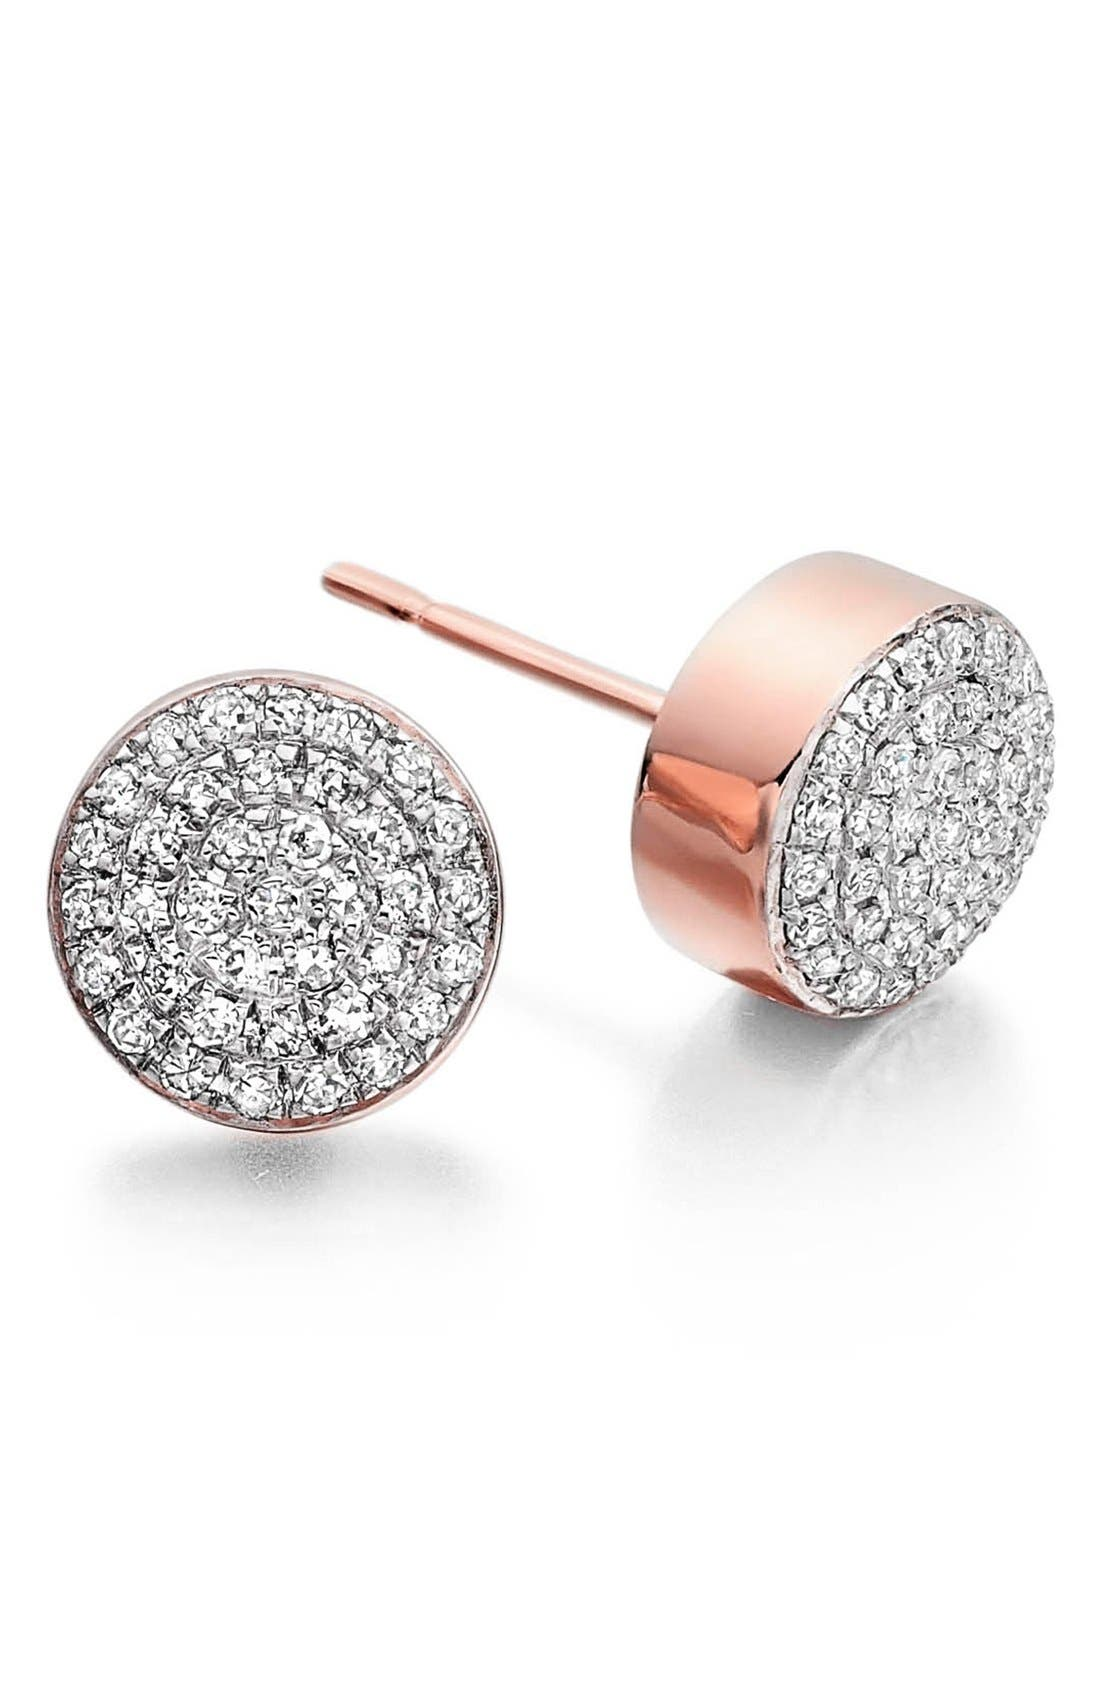 Main Image - Monica Vinader 'Ava' Diamond Button Stud Earrings